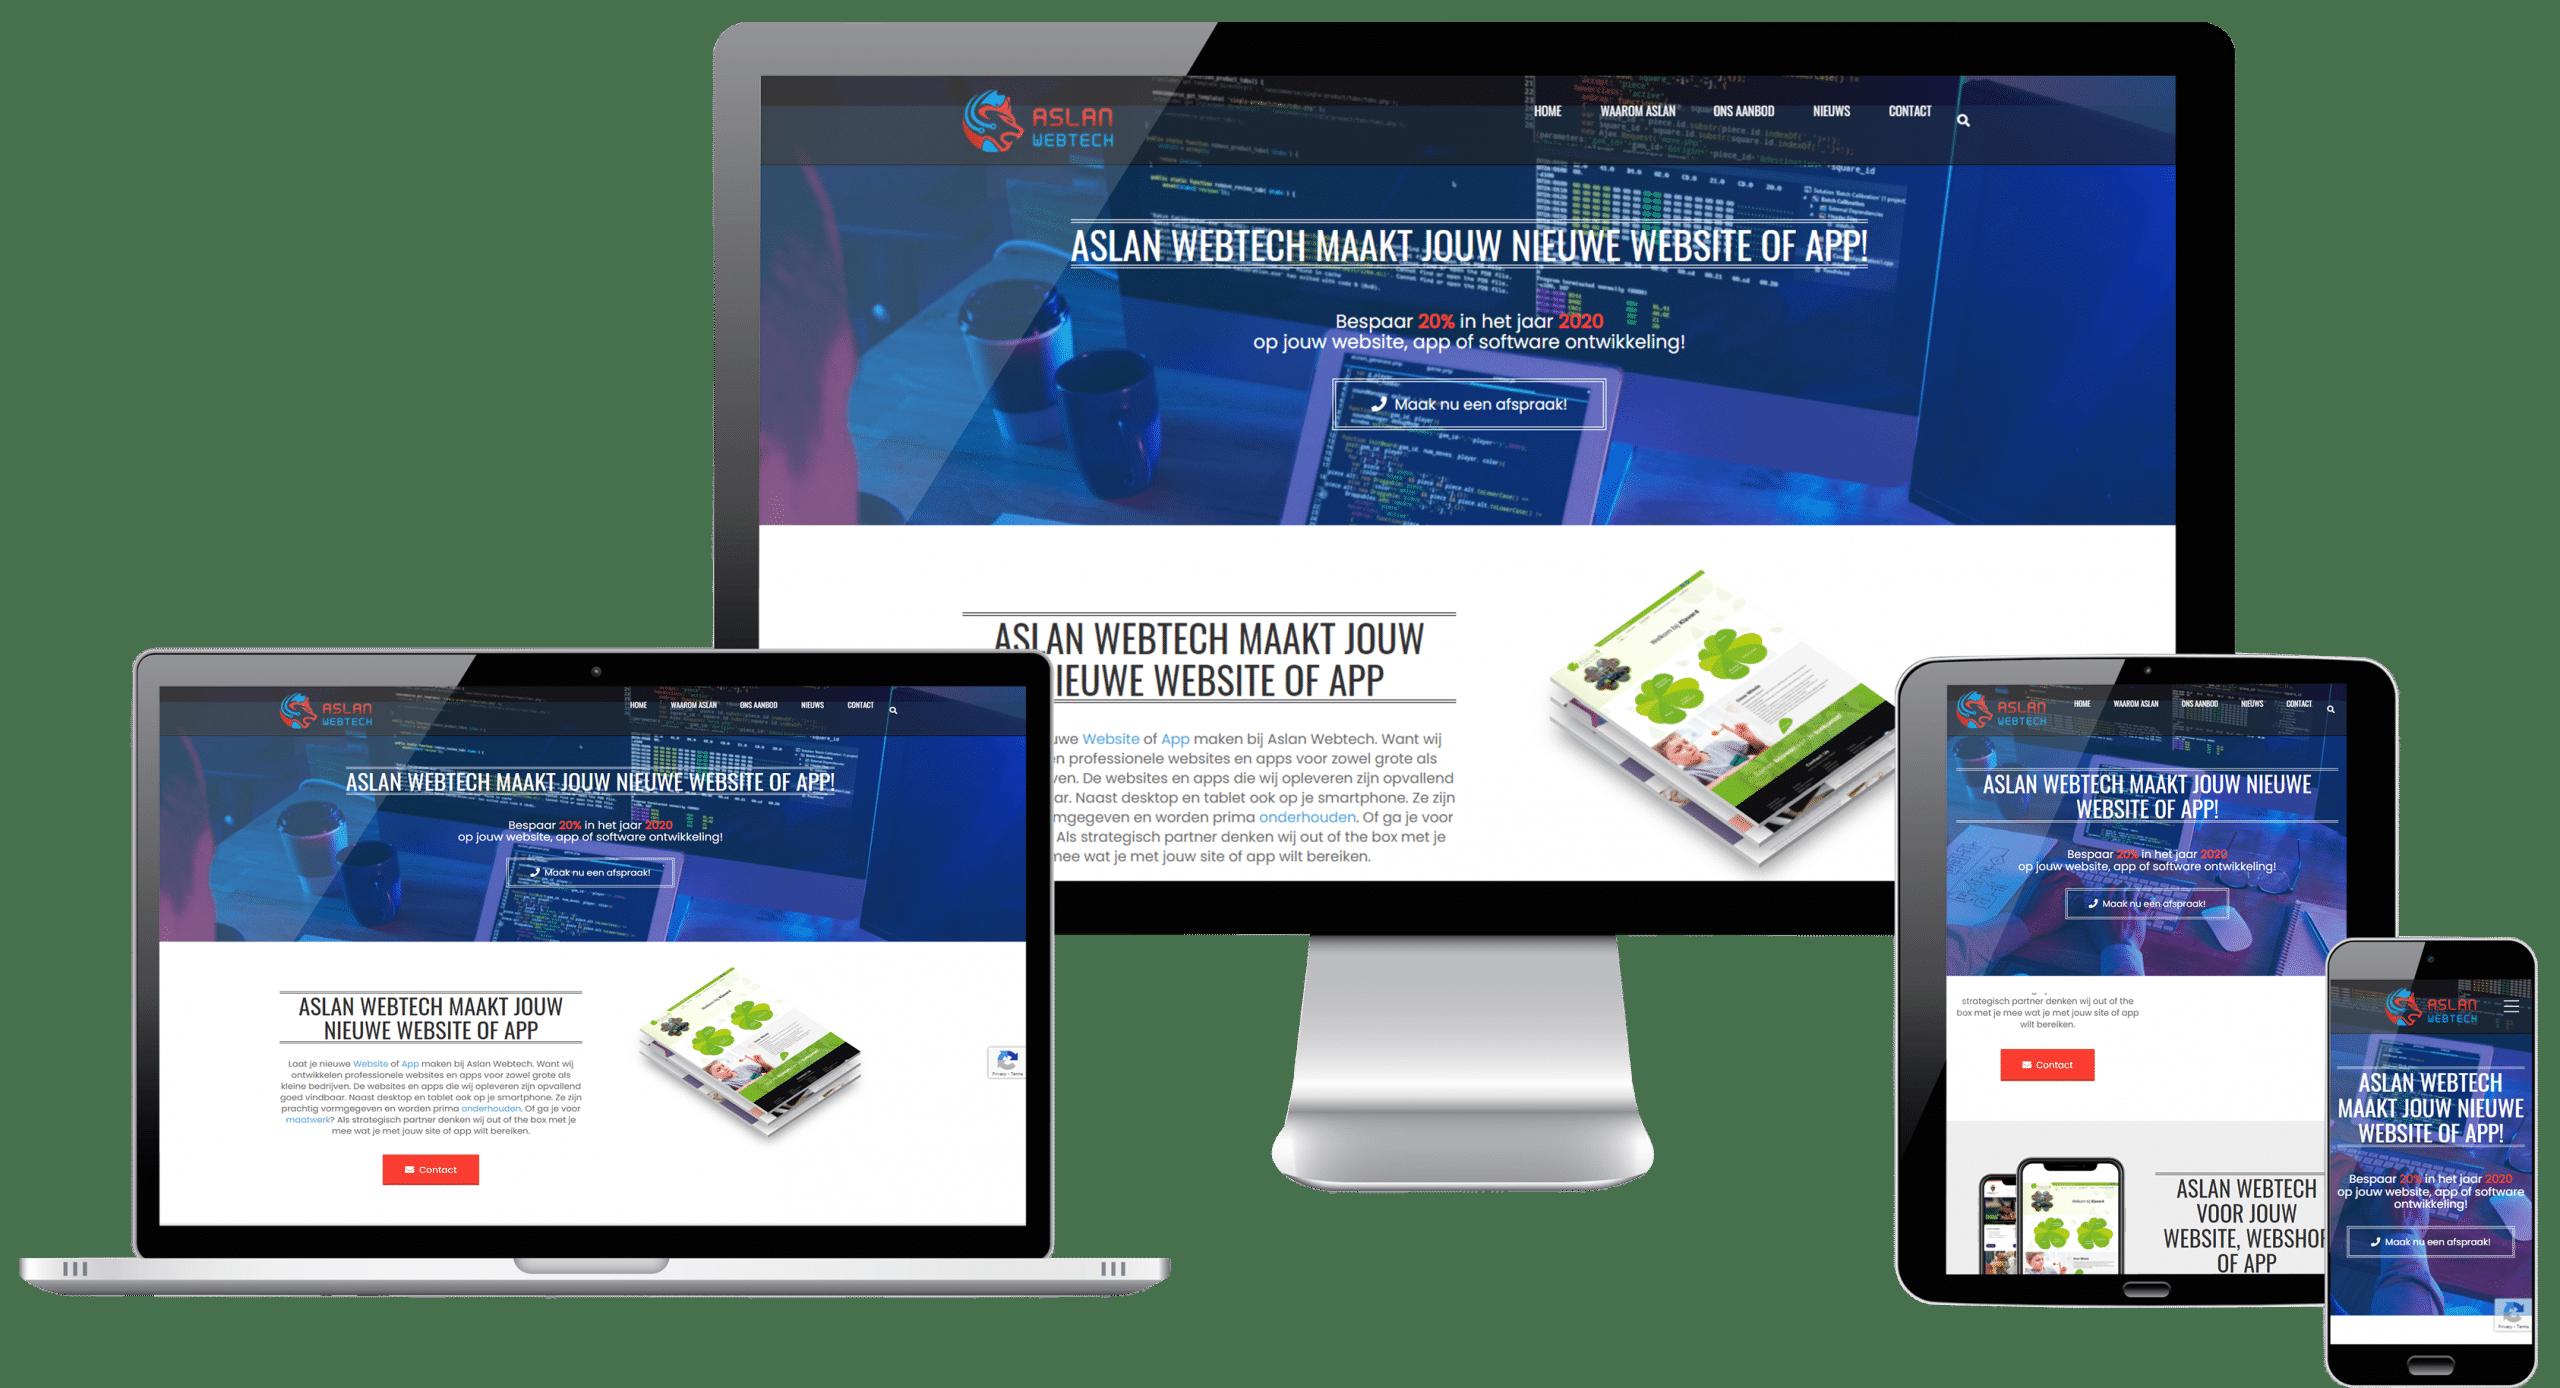 Professionele-webProfessionele-website-Aslan-Webtechsite-Aslan-Webtech